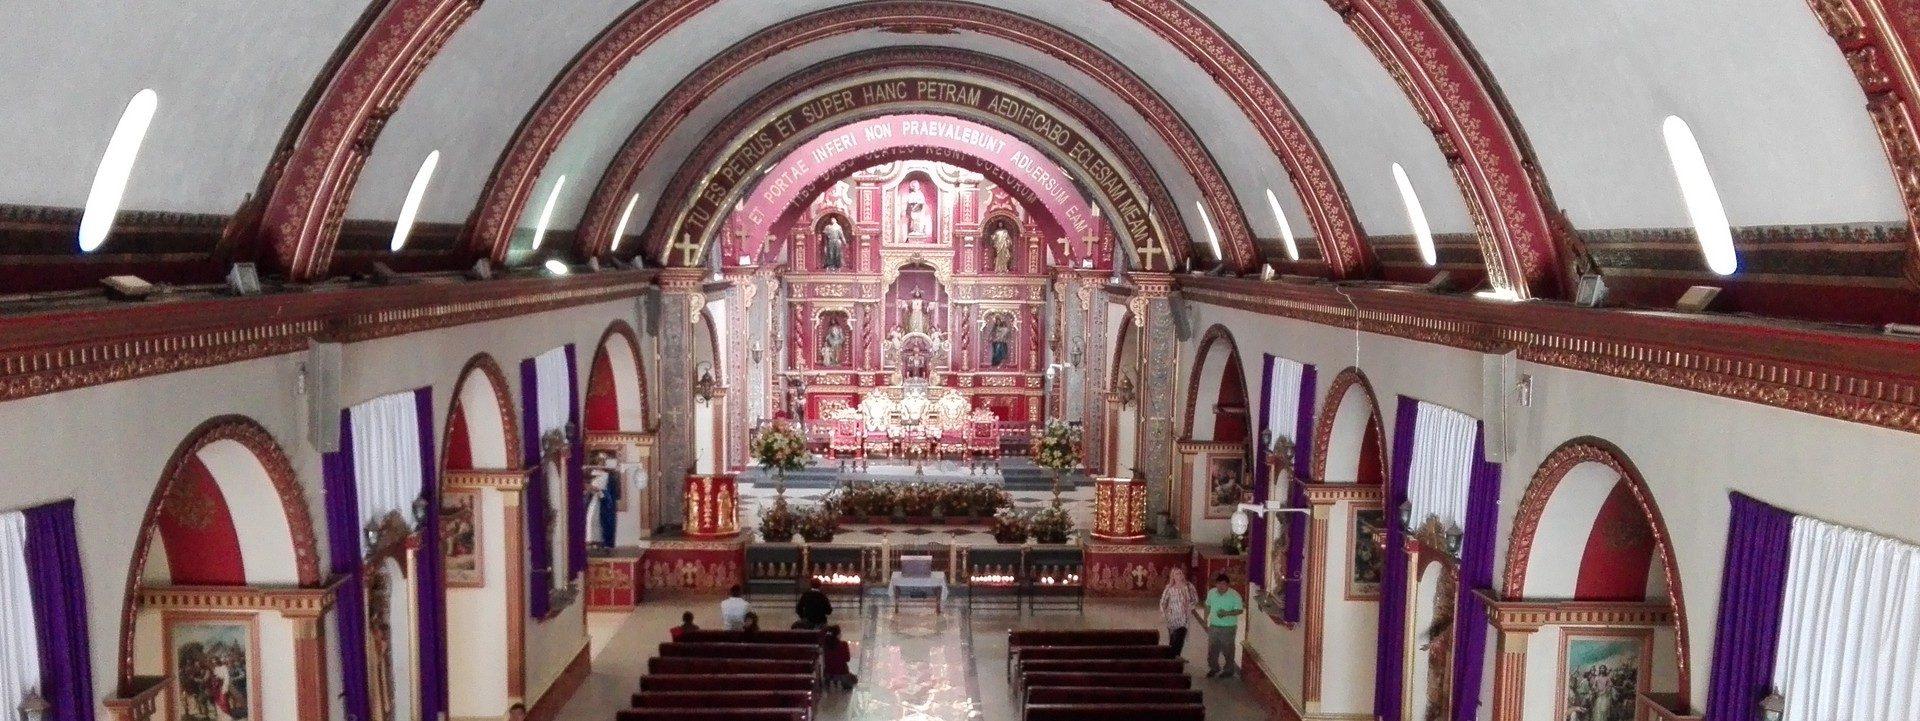 Parroquia San Pedro Apostol, Soloma, Huehuetenango